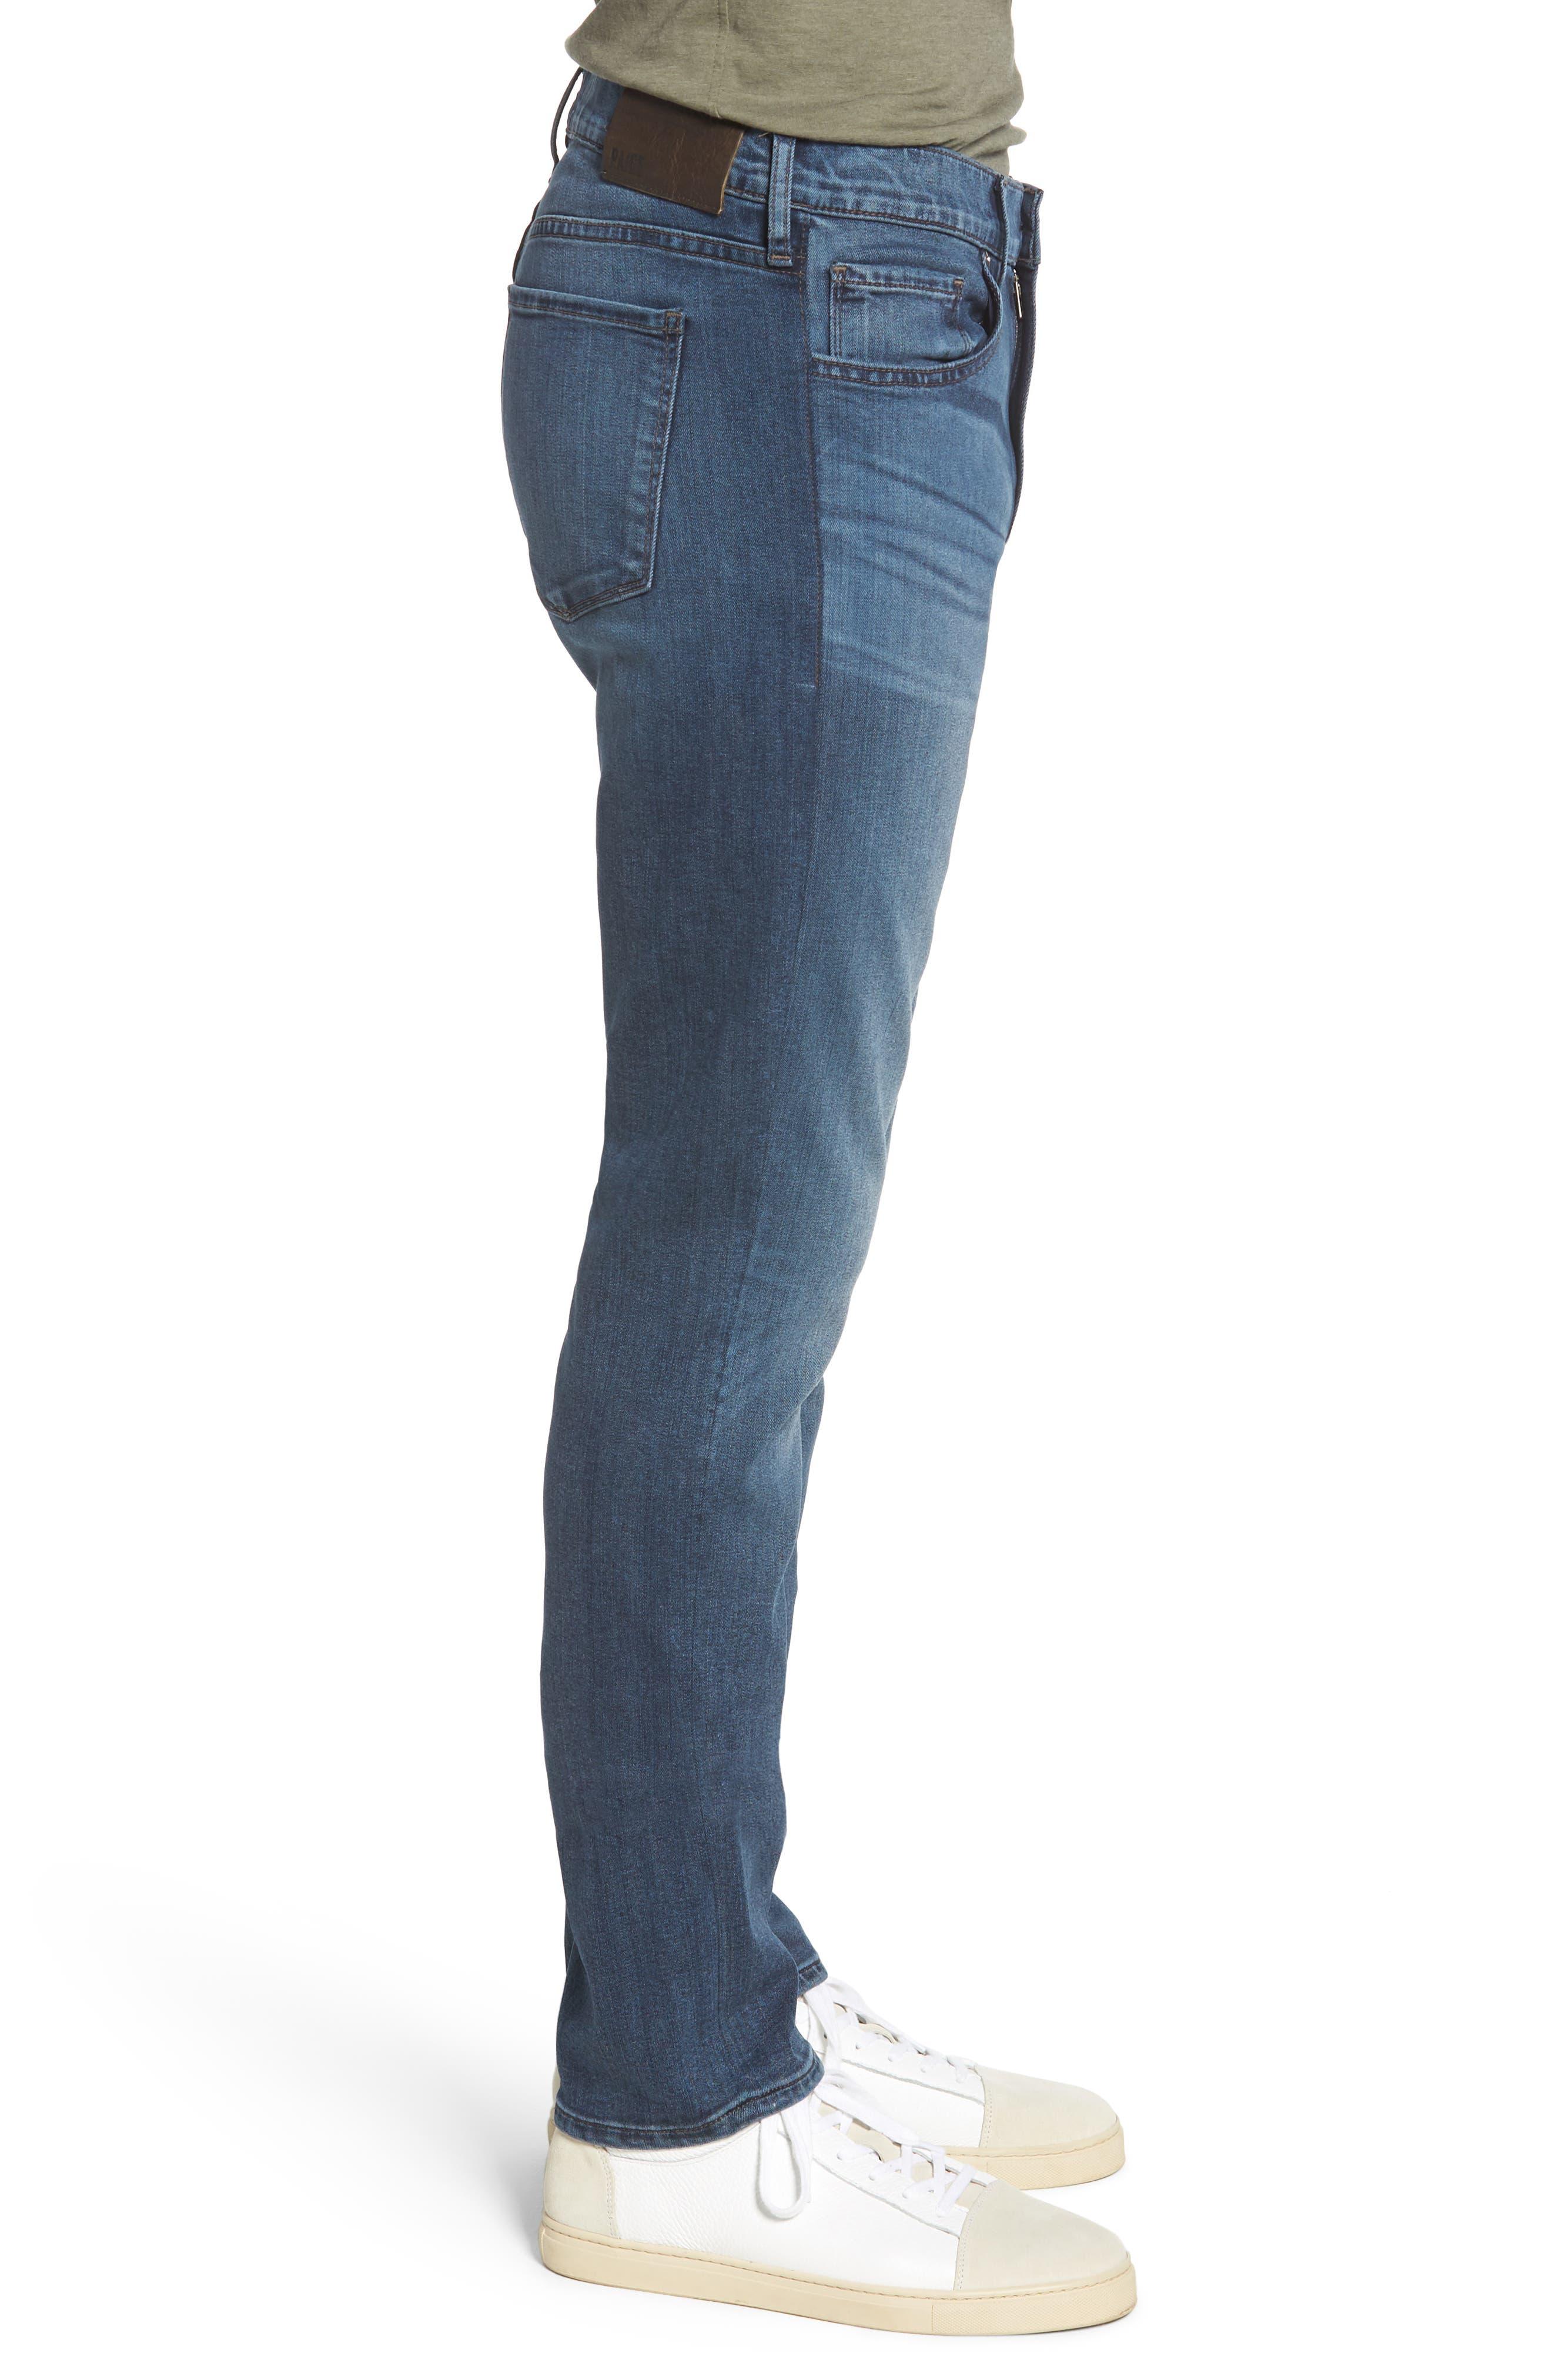 Transcend - Lennox Slim Fit Jeans,                             Alternate thumbnail 3, color,                             GRAMMERCY